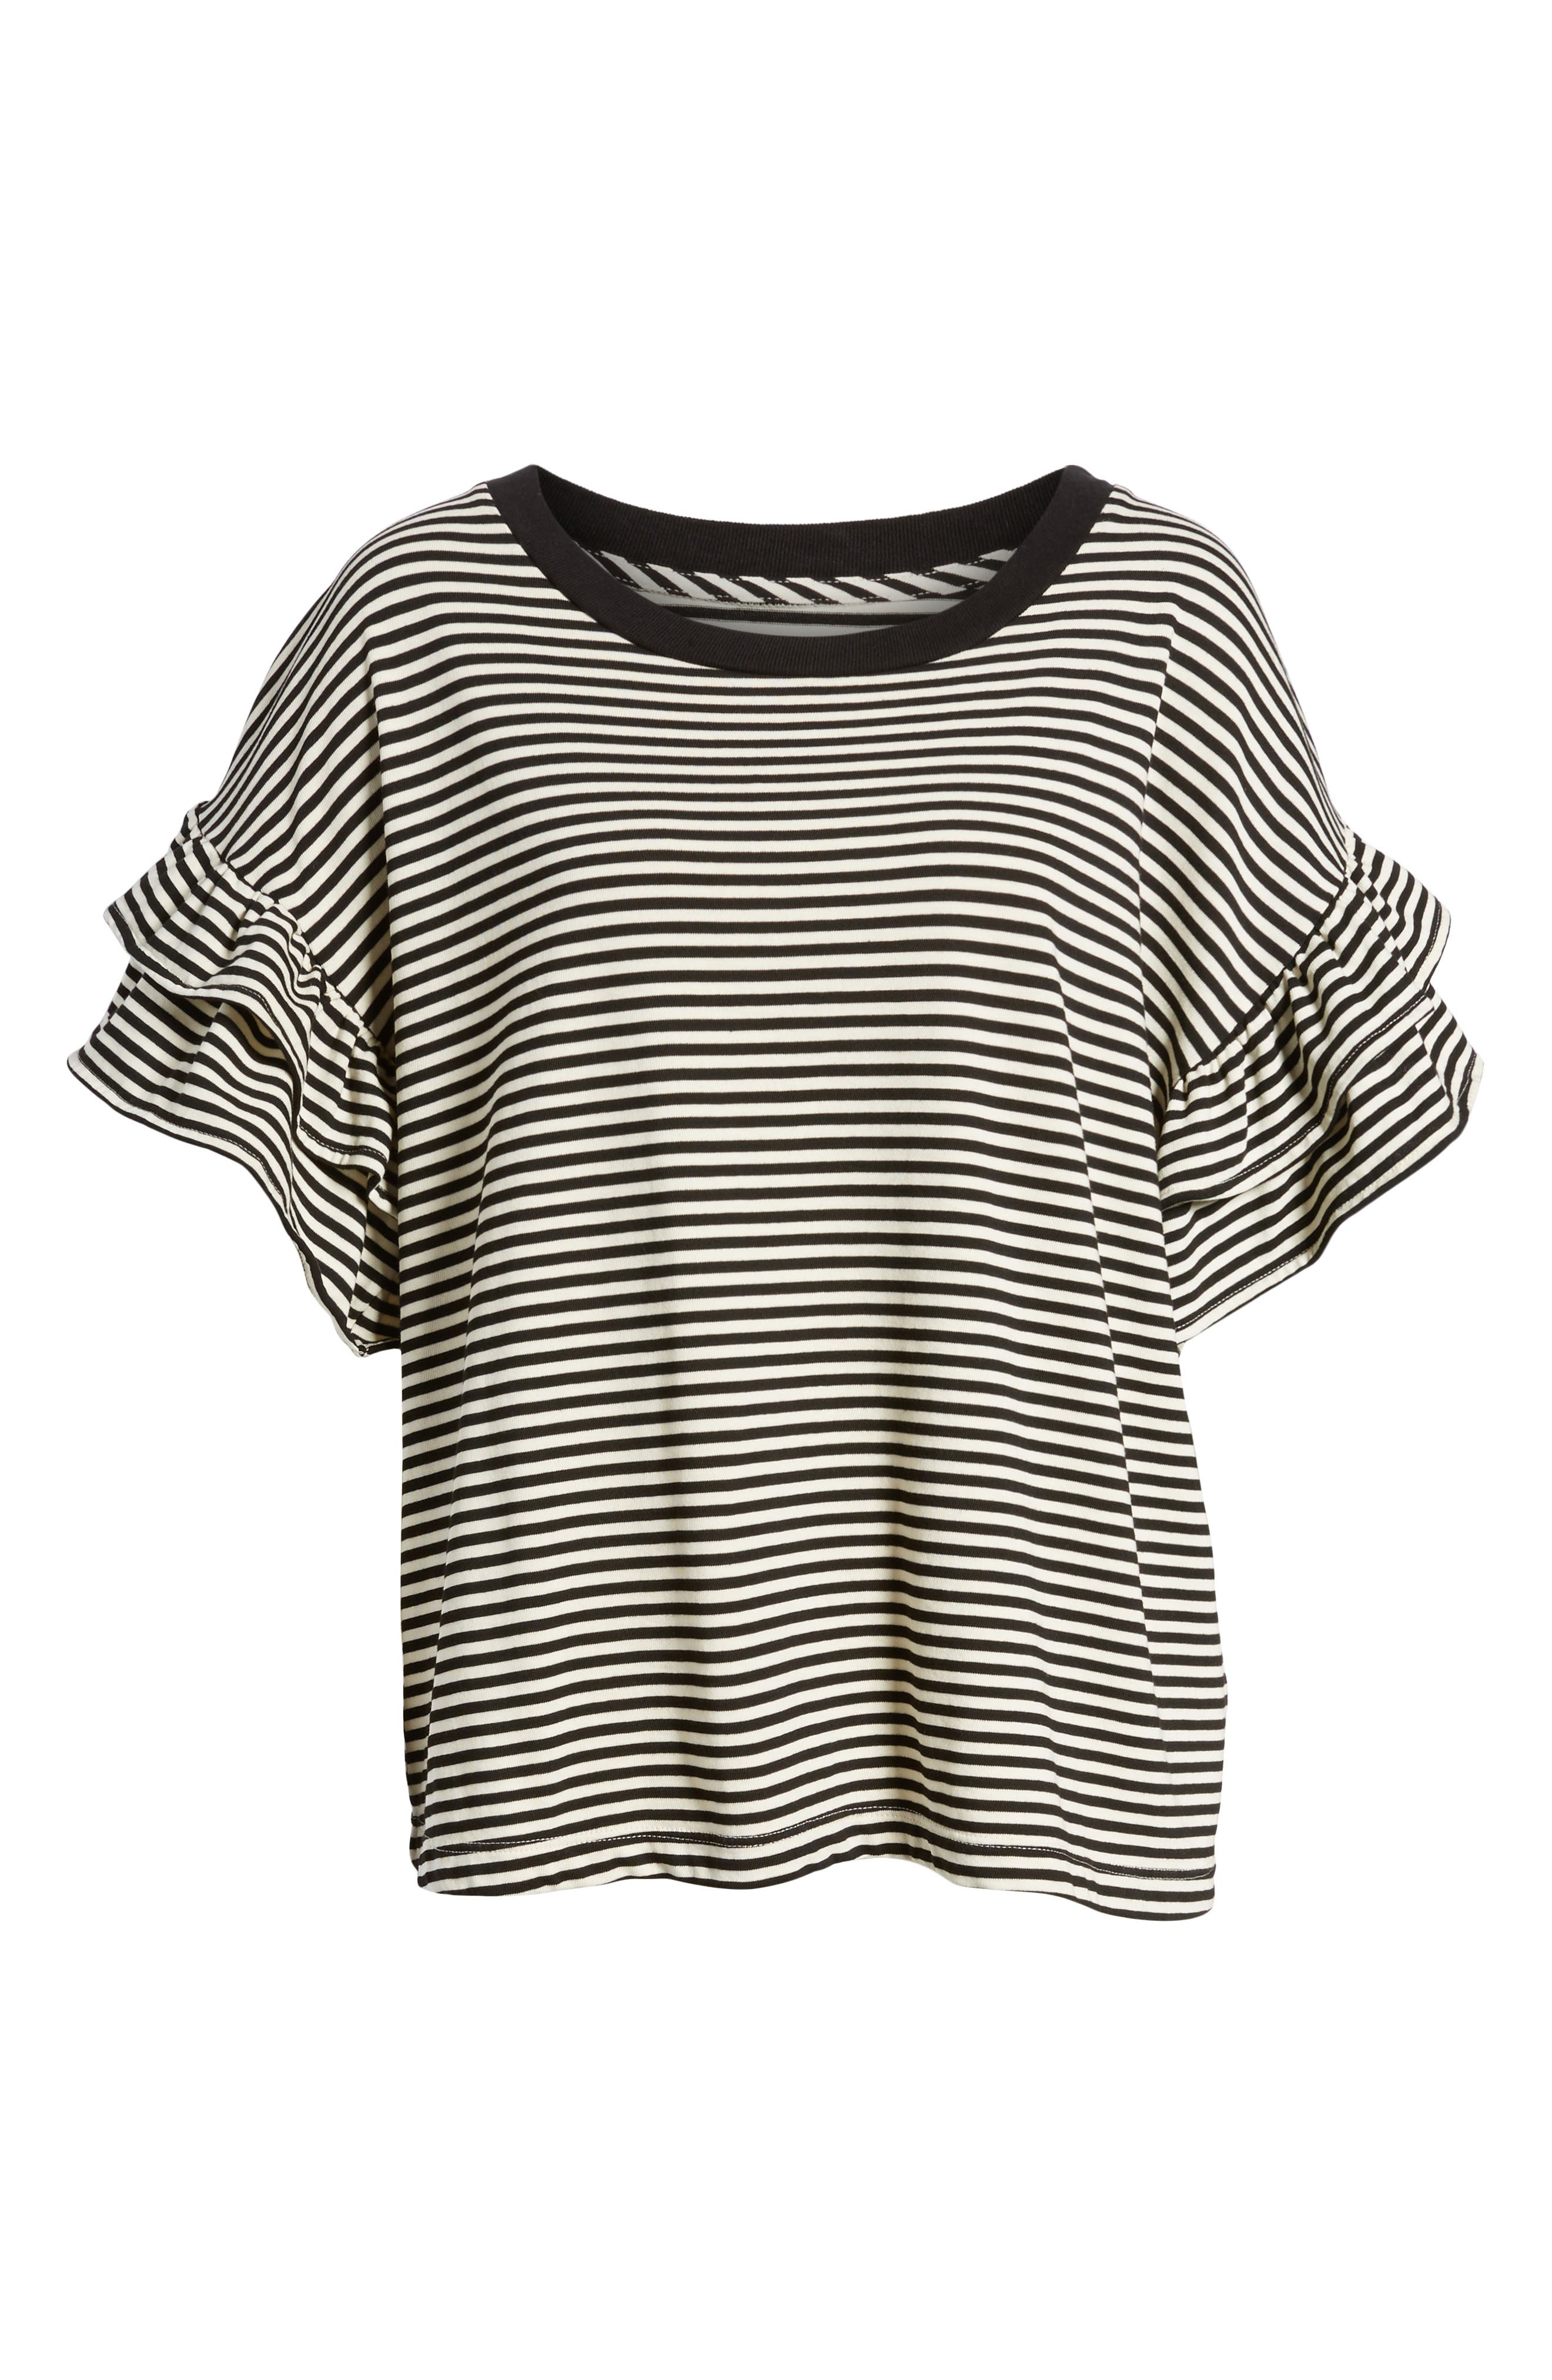 The Carina Tee,                             Alternate thumbnail 7, color,                             Black And White Feeder Stripe